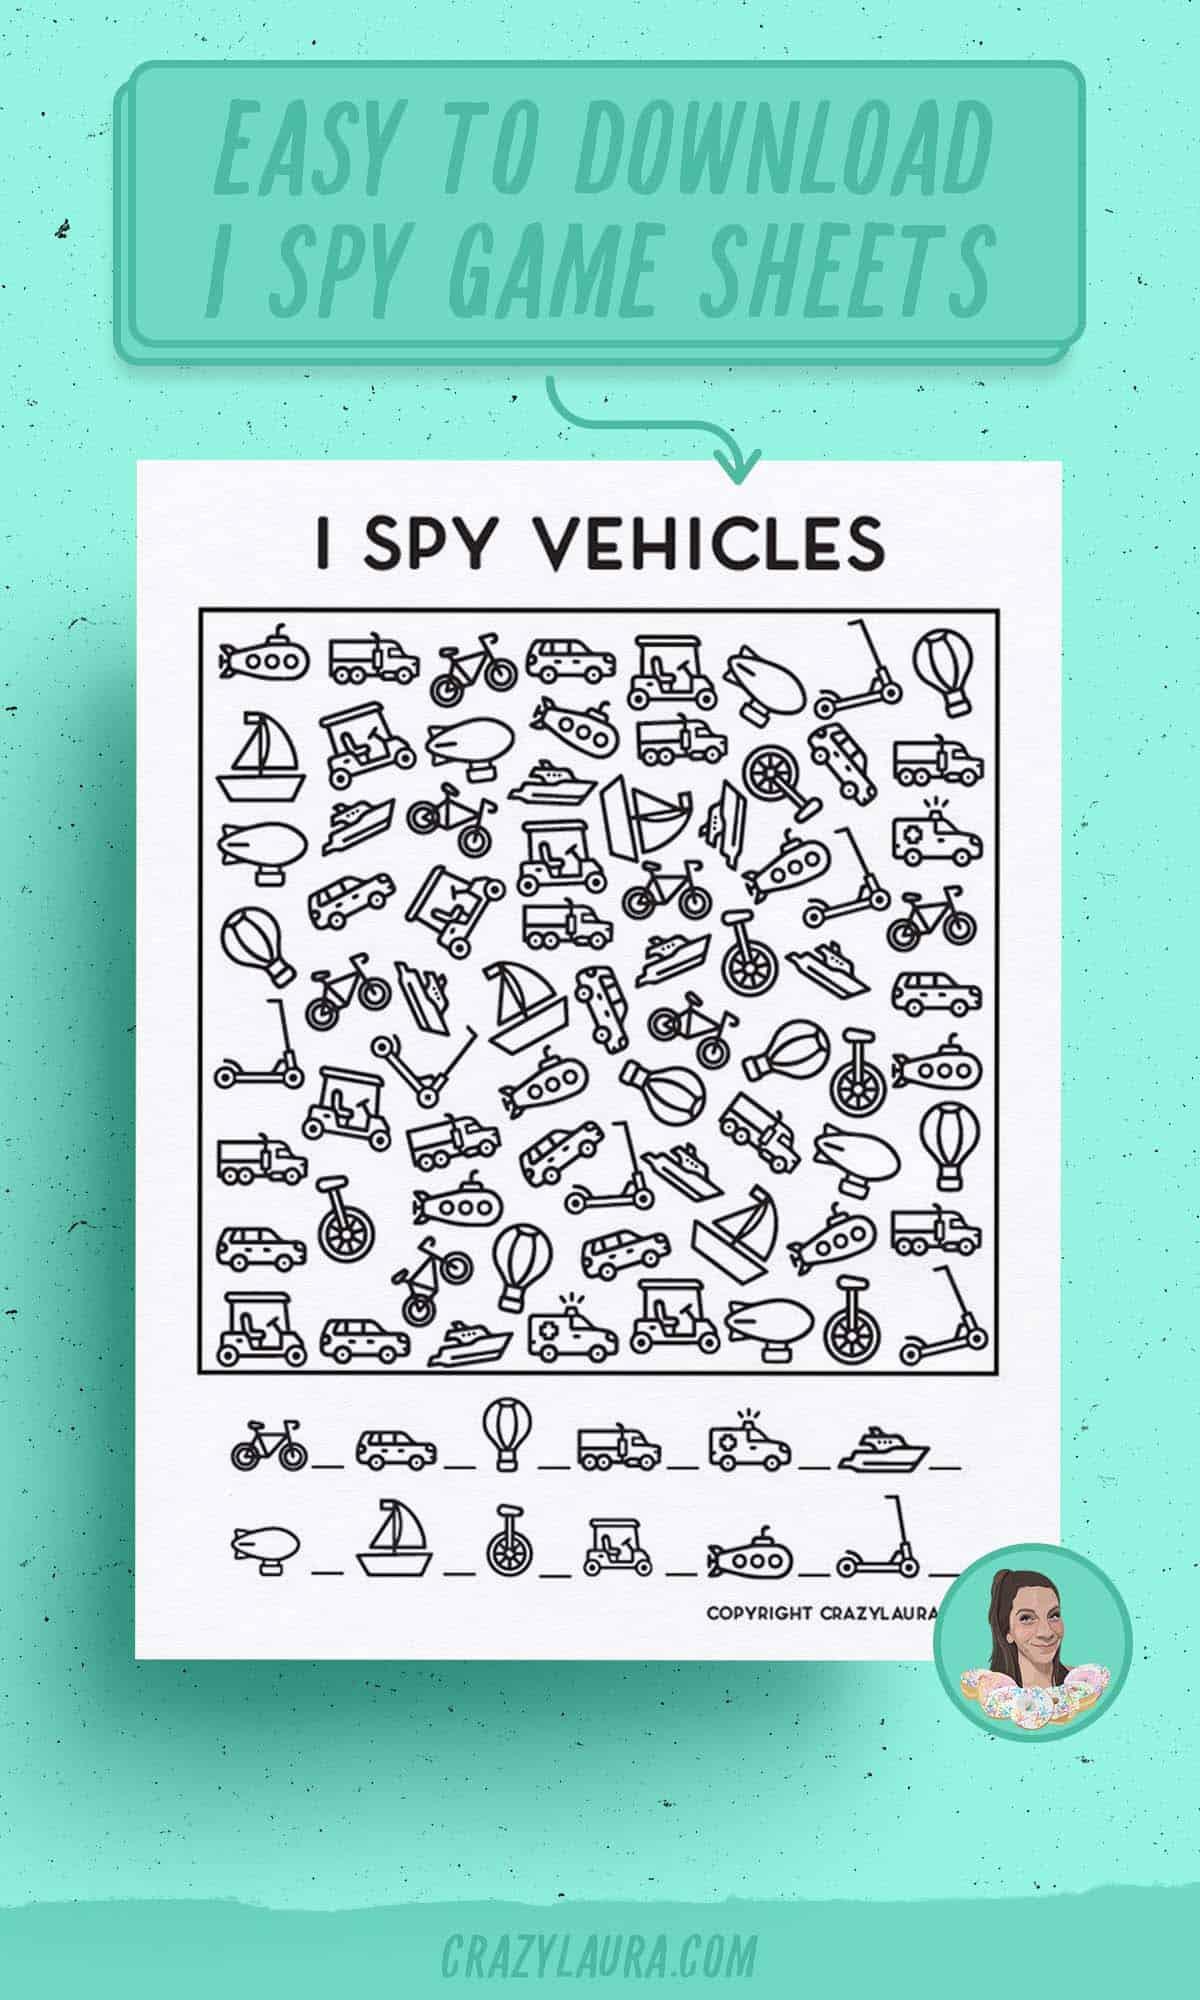 i spy templates with vehicles